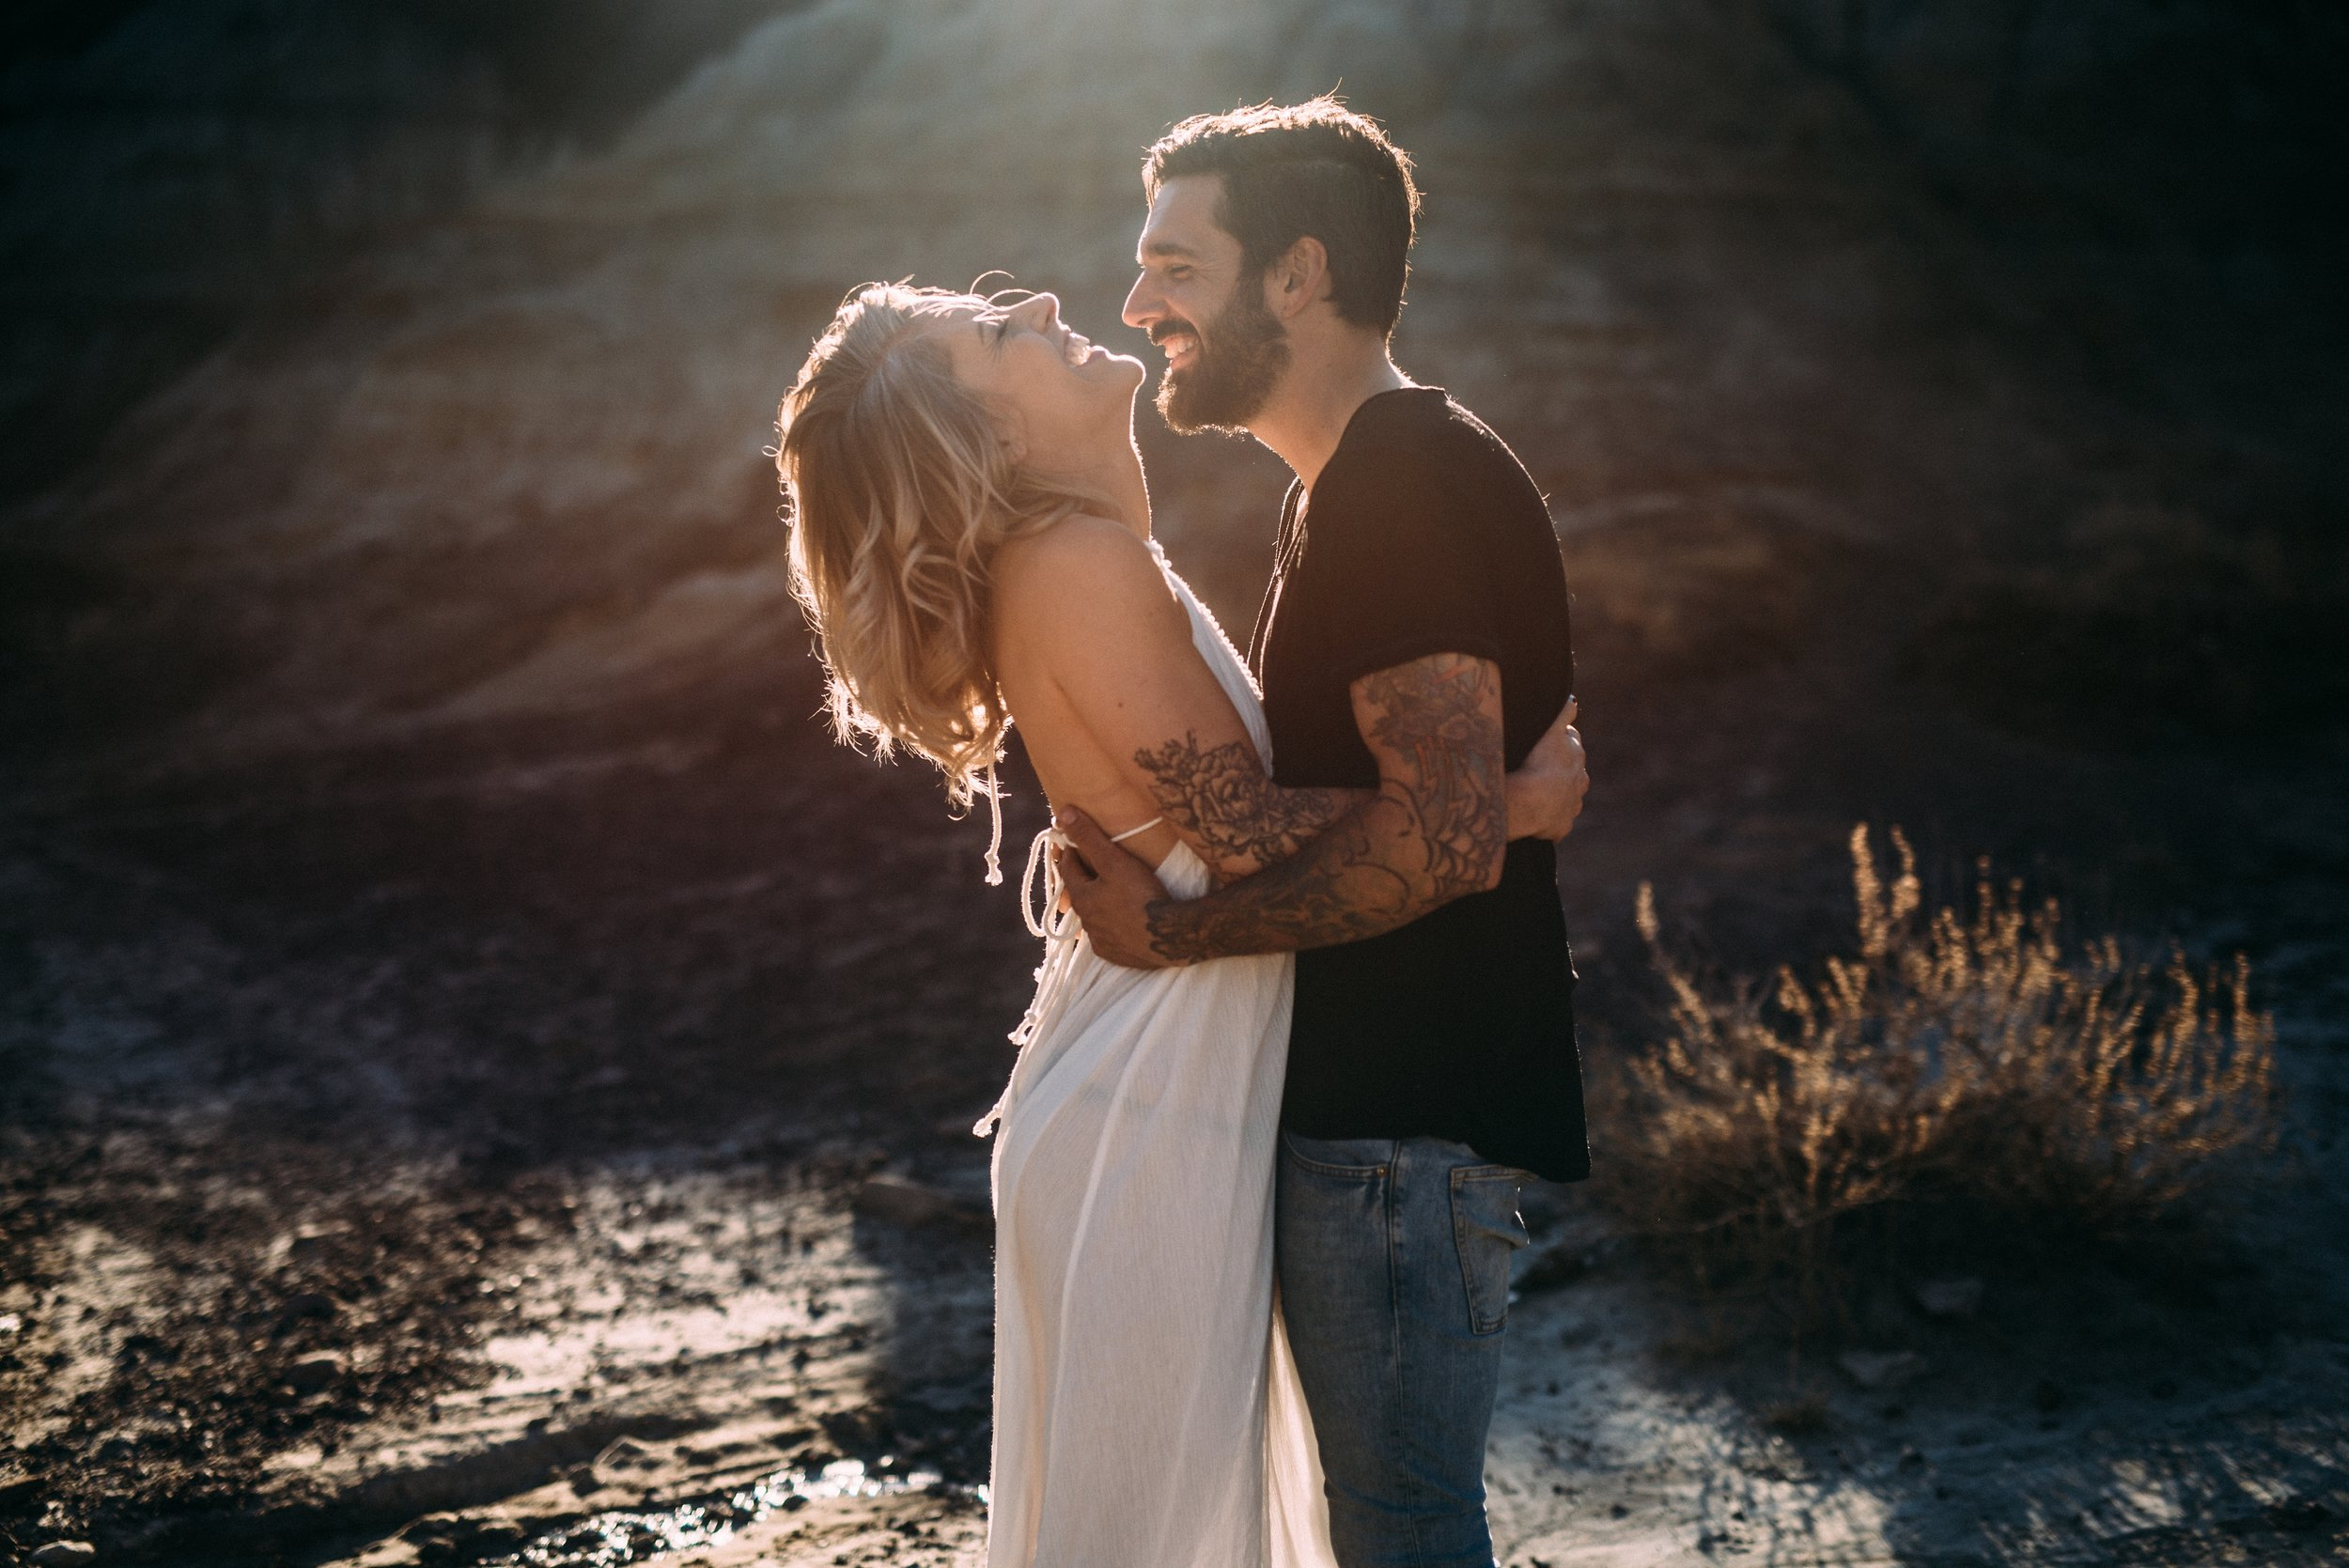 kaihla_tonai_intimate_wedding_elopement_photographer_3567